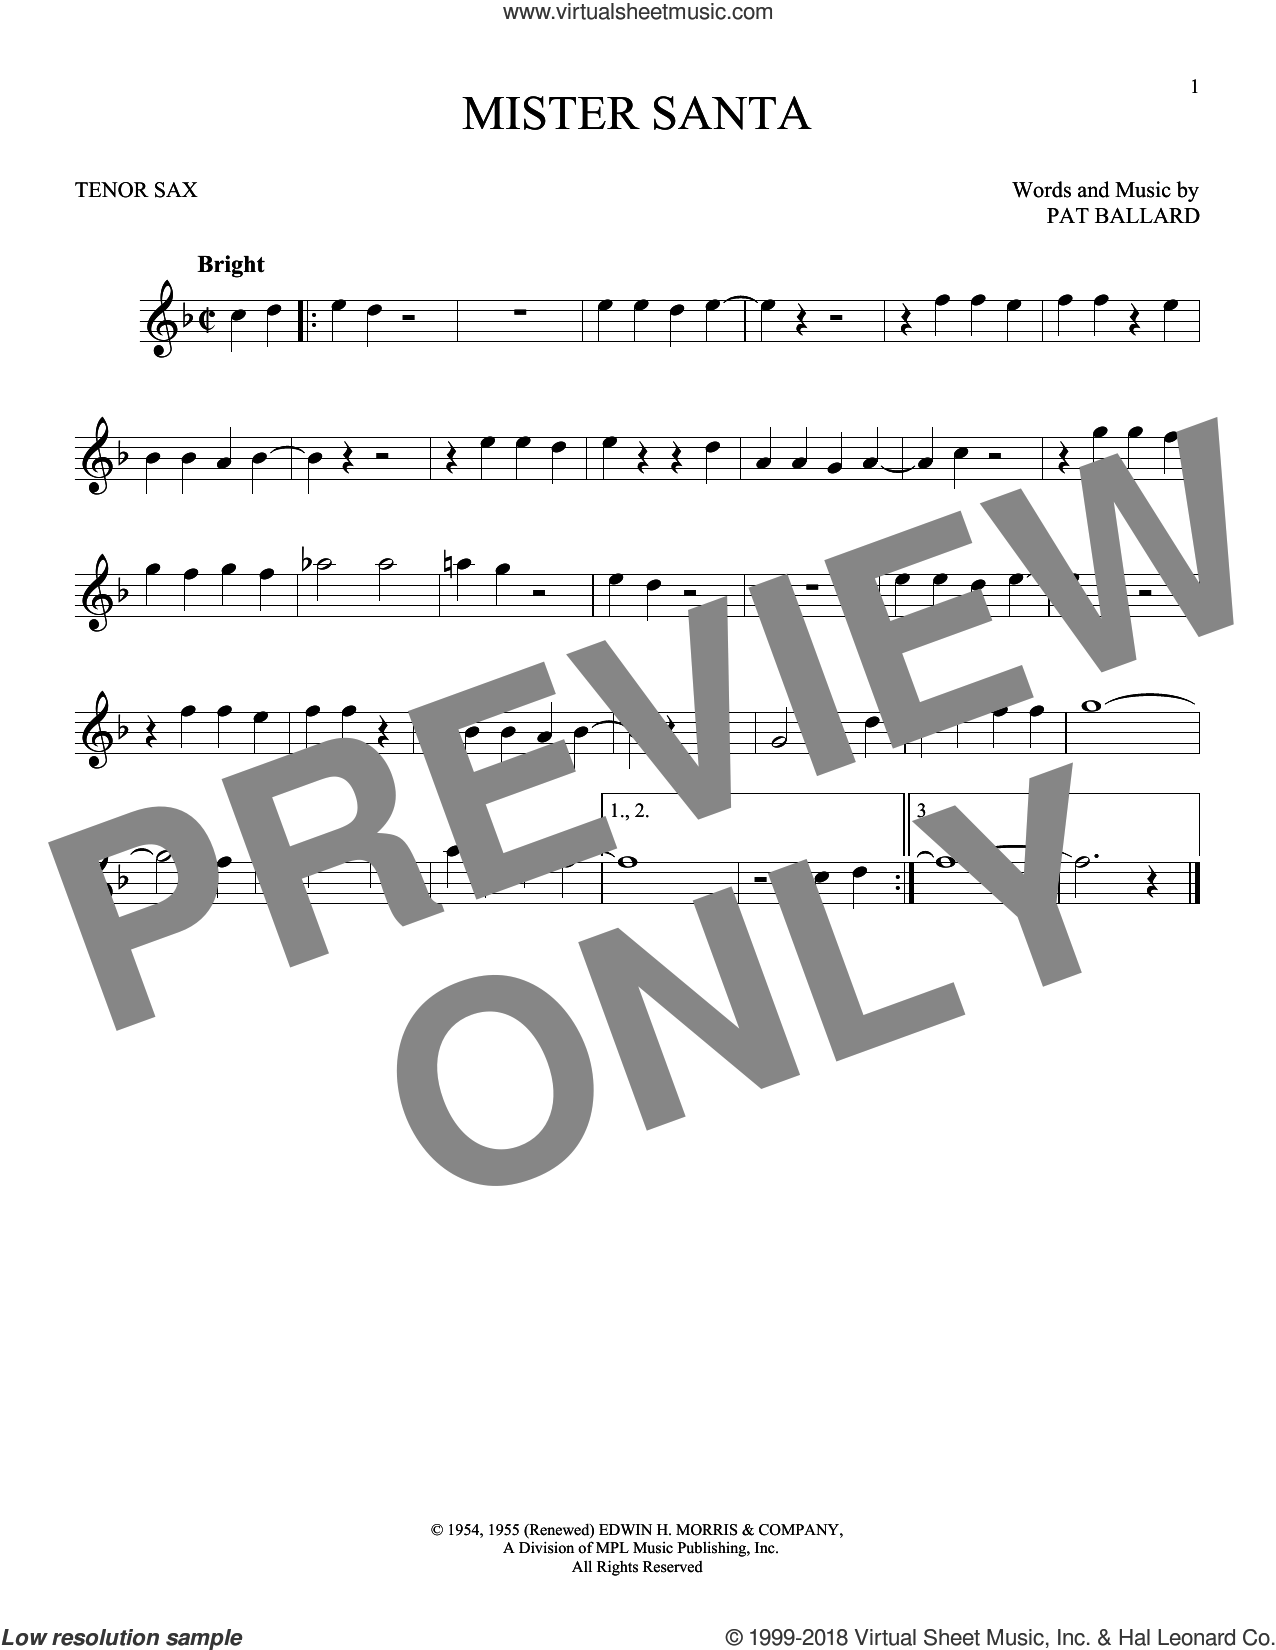 Mister Santa sheet music for tenor saxophone solo by Amy Grant and Pat Ballard, intermediate skill level